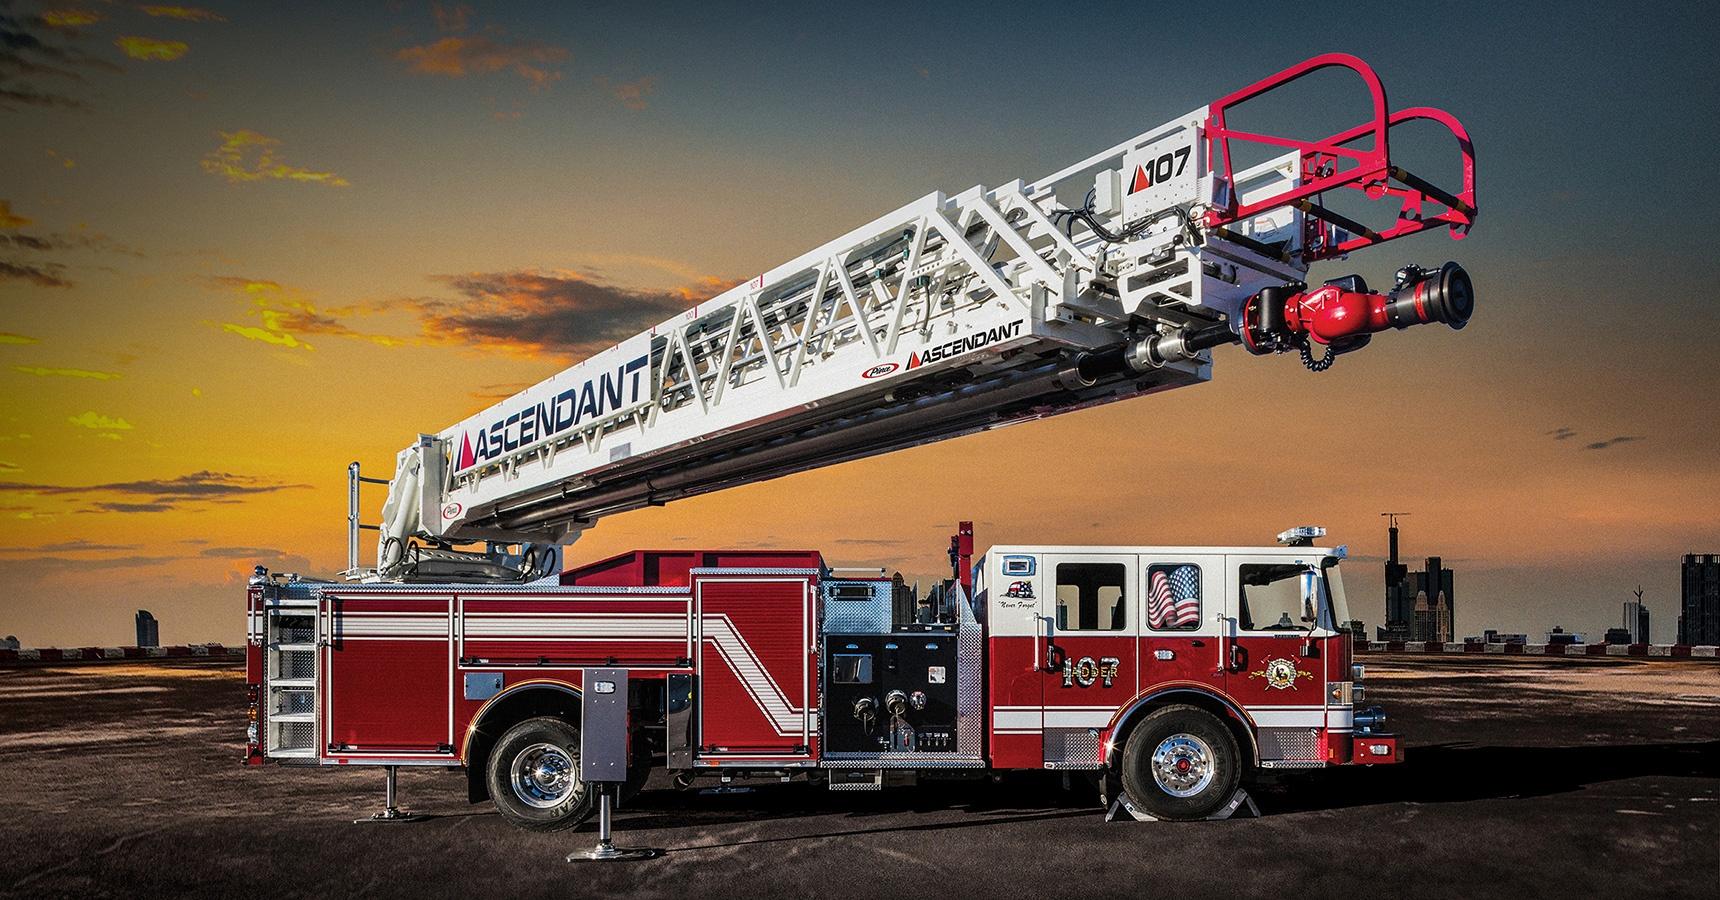 Pierce-Displays-New-Technologies-And-11-Custom-Fire-And-Emergency-Response-Apparatus-At-FDIC_Header.jpg